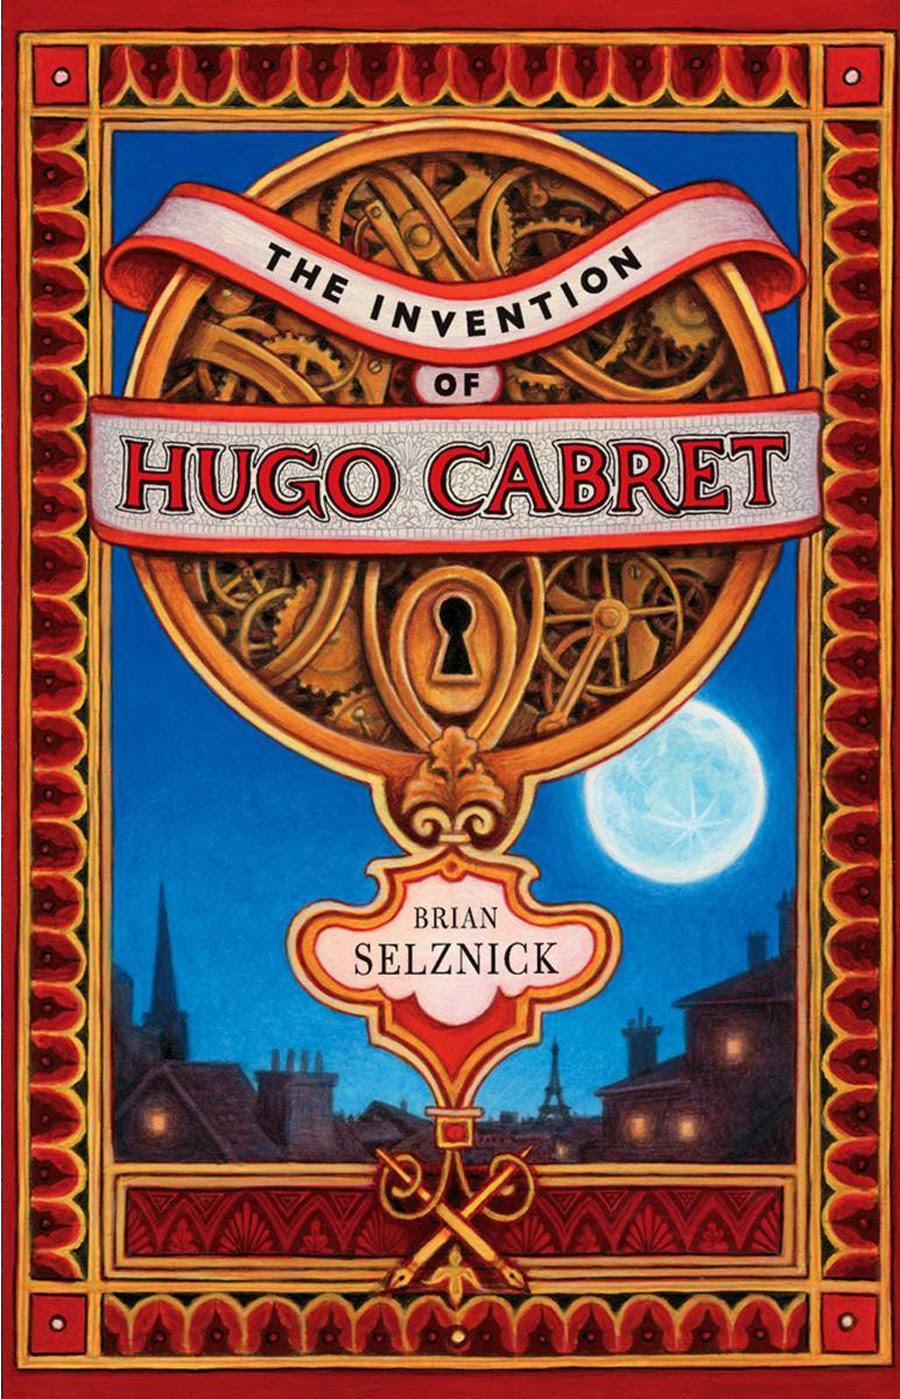 The_Invention_of_Hugo_Cabret.jpg